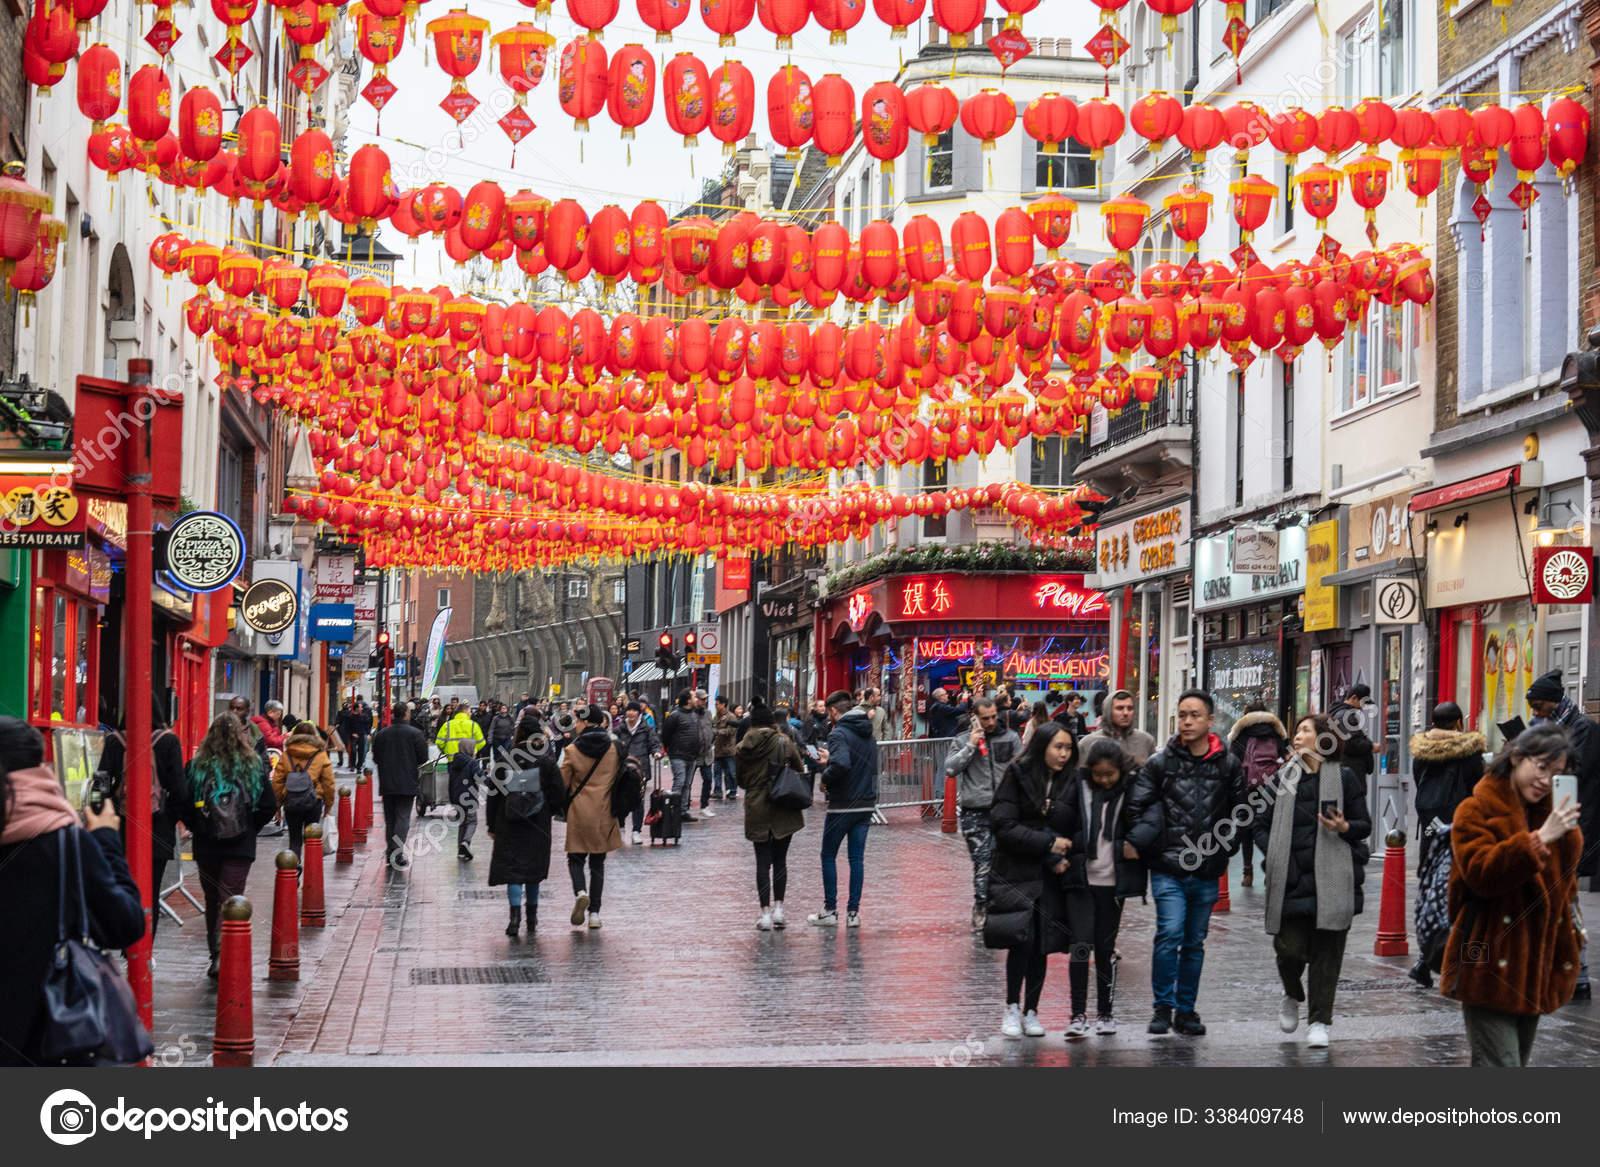 London January 26 2020 Chinese Paper Lanterns London Chinatown Chinese New Year Celebrations Stock Editorial Photo C Powerofflowers 338409748